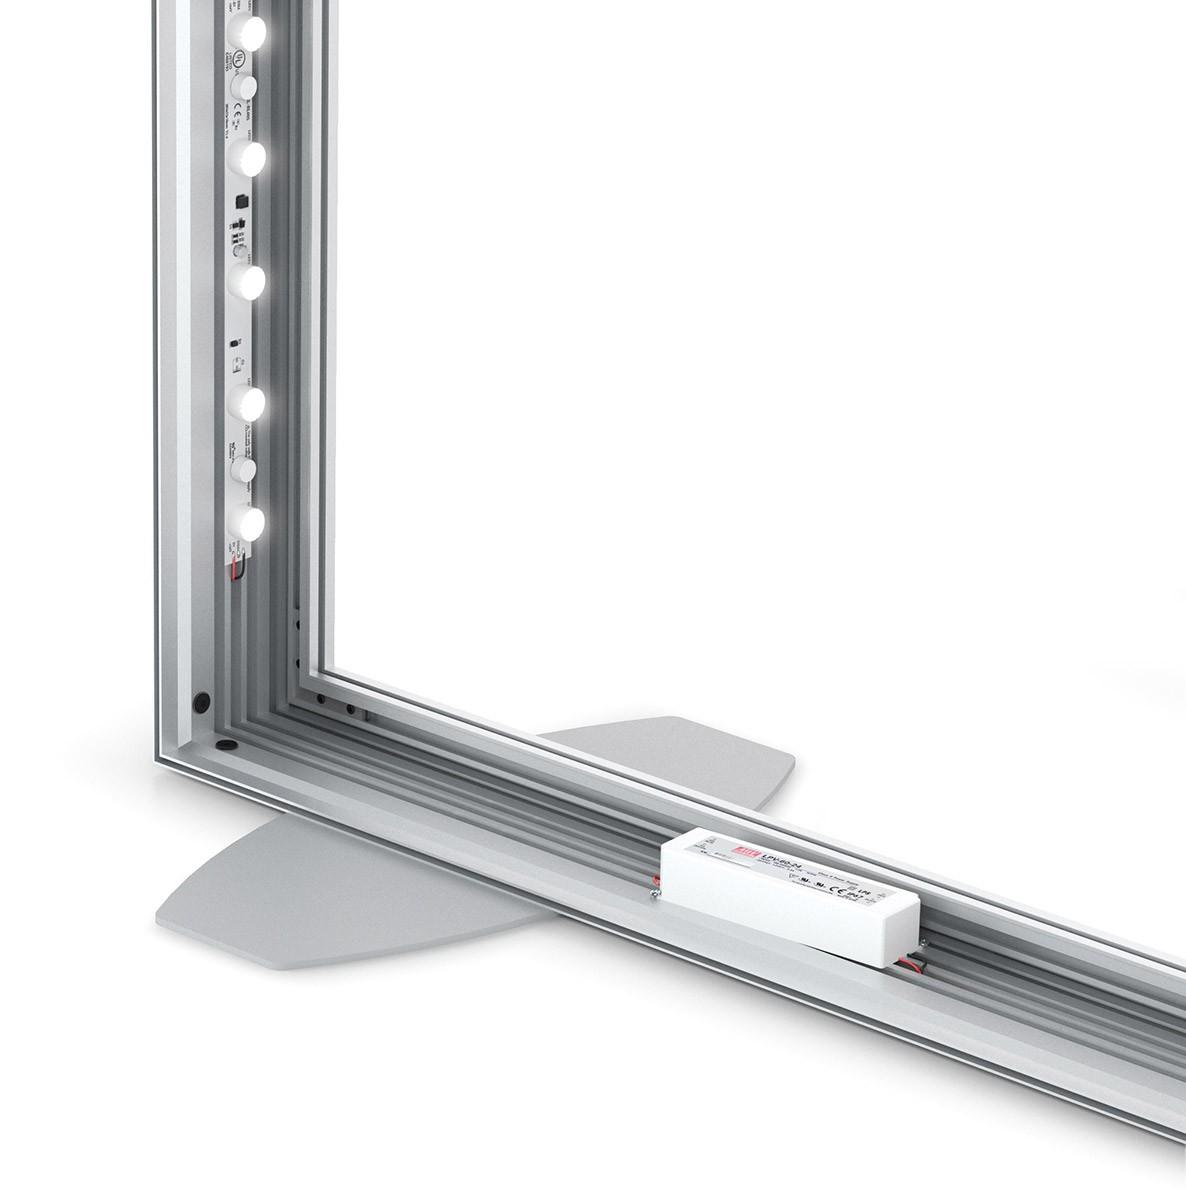 Charisma 48x96 Single Sided LED SEG Fabric Light Box